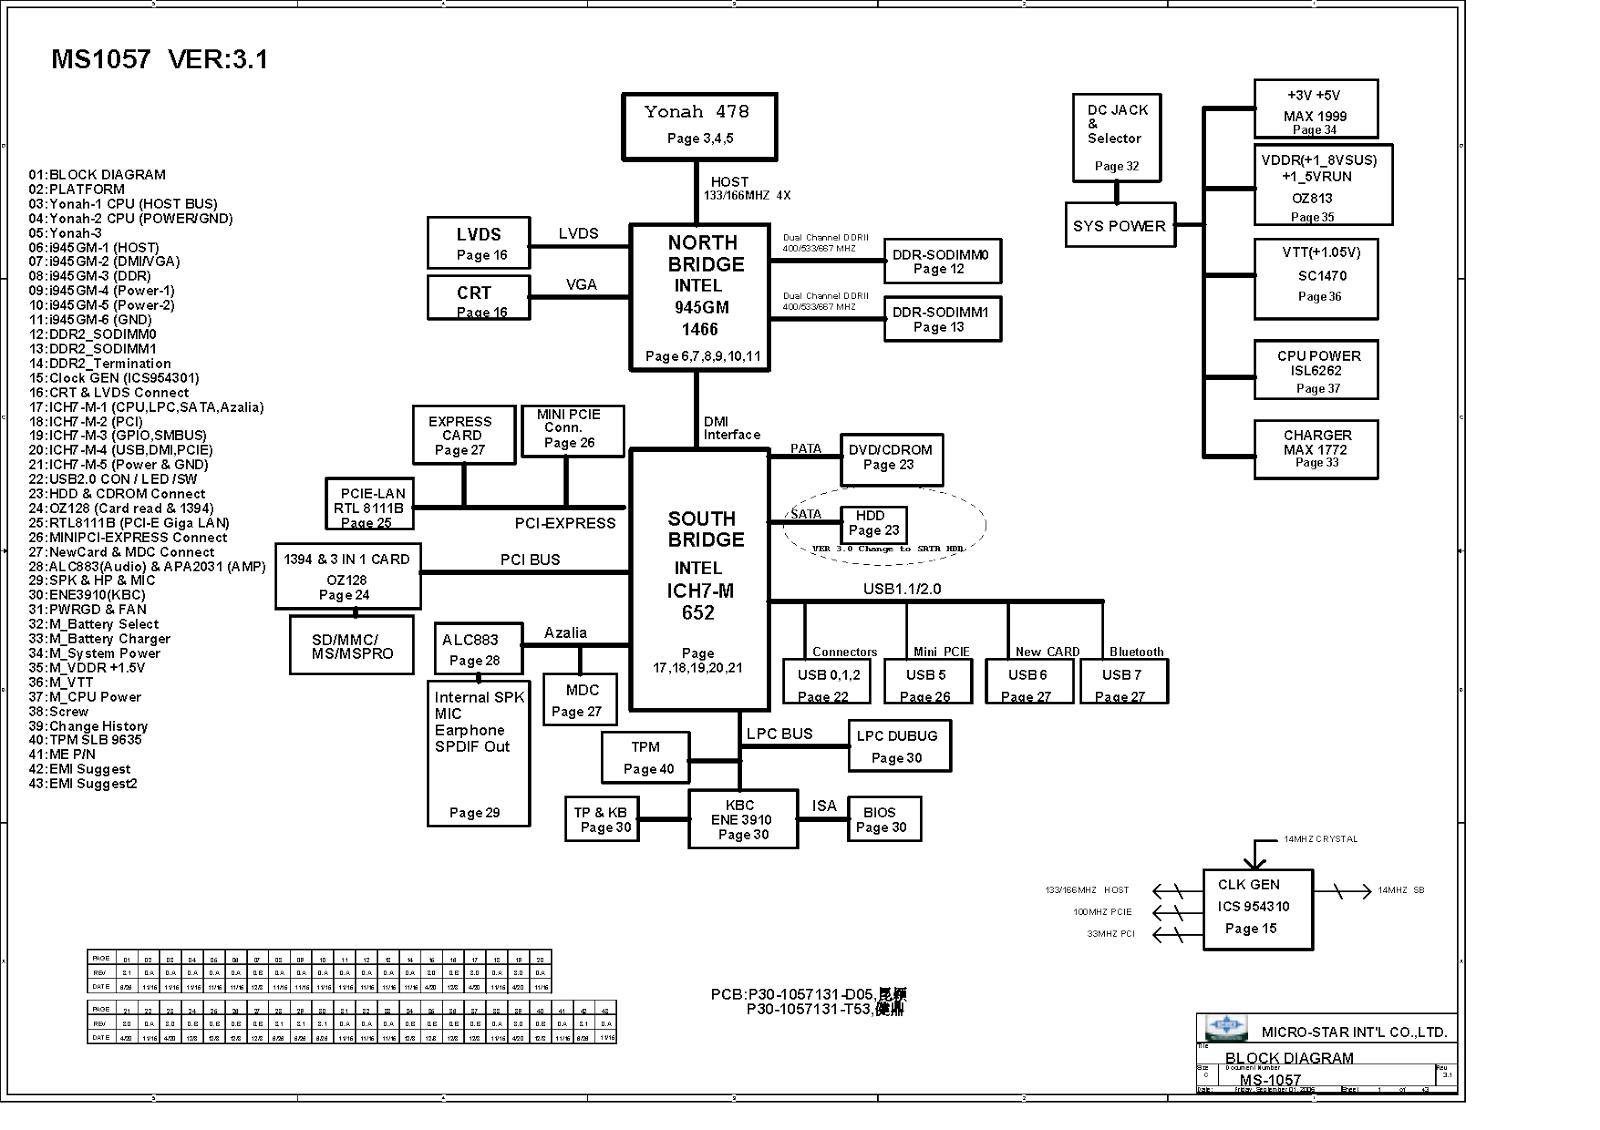 medium resolution of the motherboard schematic for msi megabook s262 laptop notebook ms 1057 motherboard cpu yonah 478 north bridge intel 945gm south bridge intel ich7 m